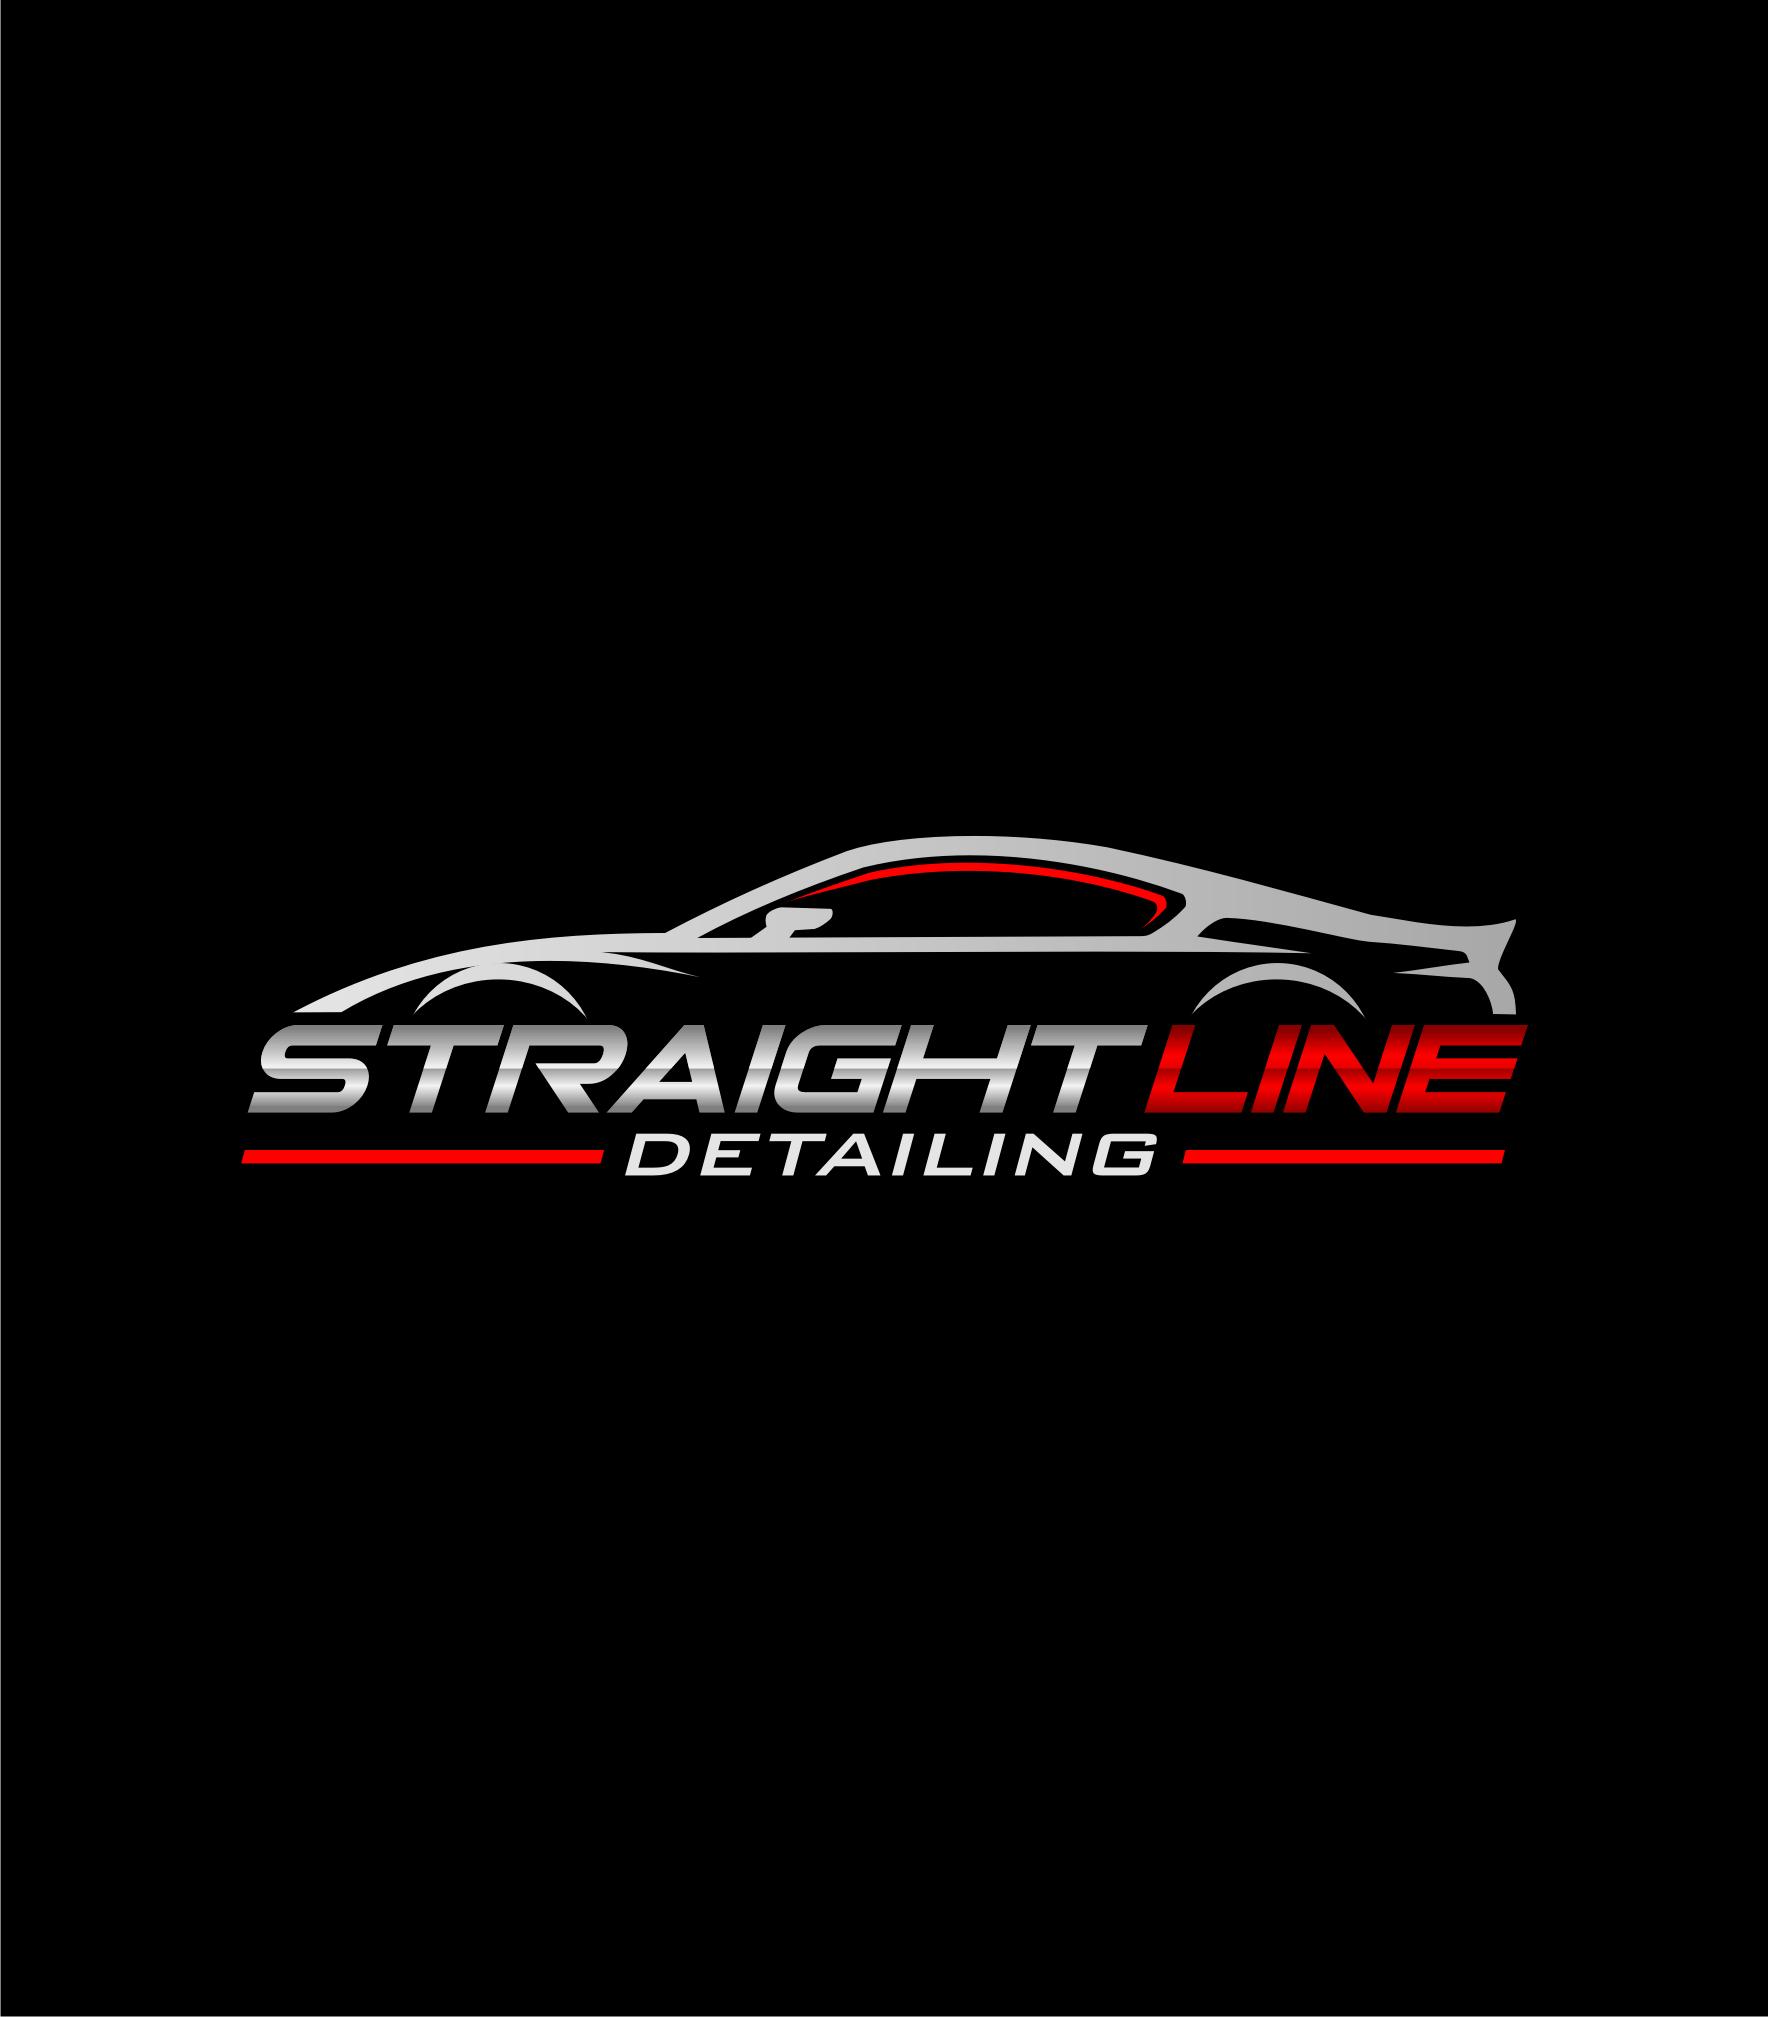 Generic & overused logo designs sold - Straightline Automotive ...